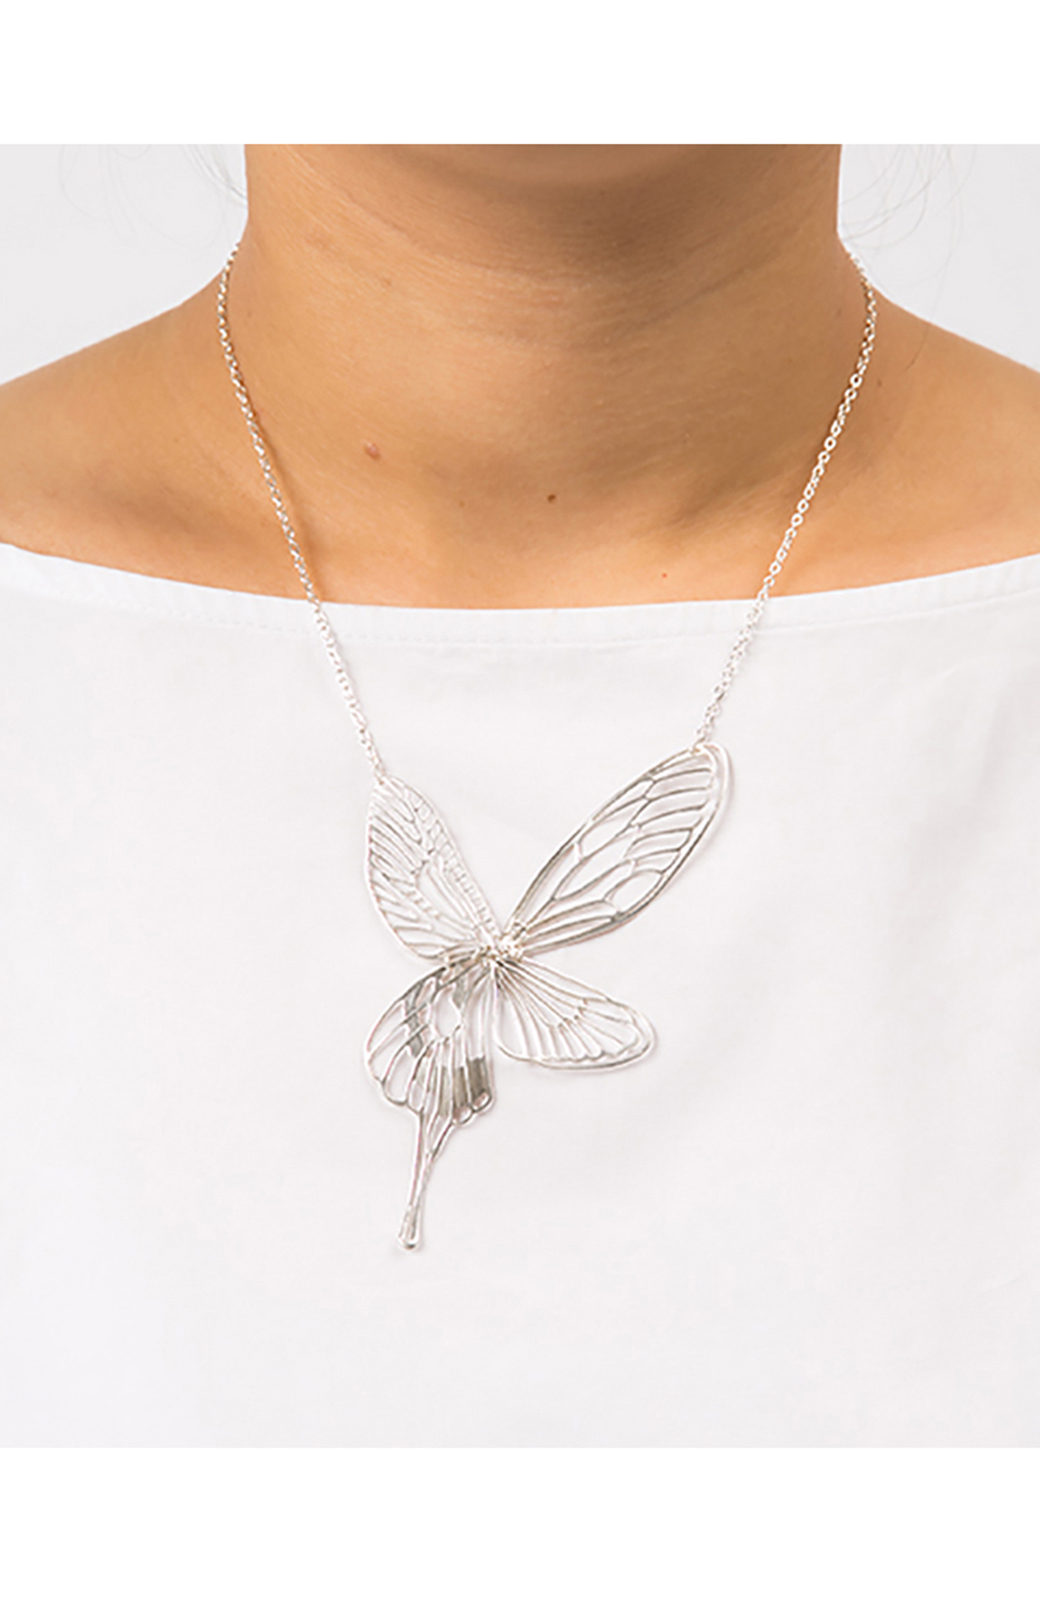 haco! てとひとて MARZO DERICATE AIR 昆虫の羽シルバーネックレス <シルバー>の商品写真6